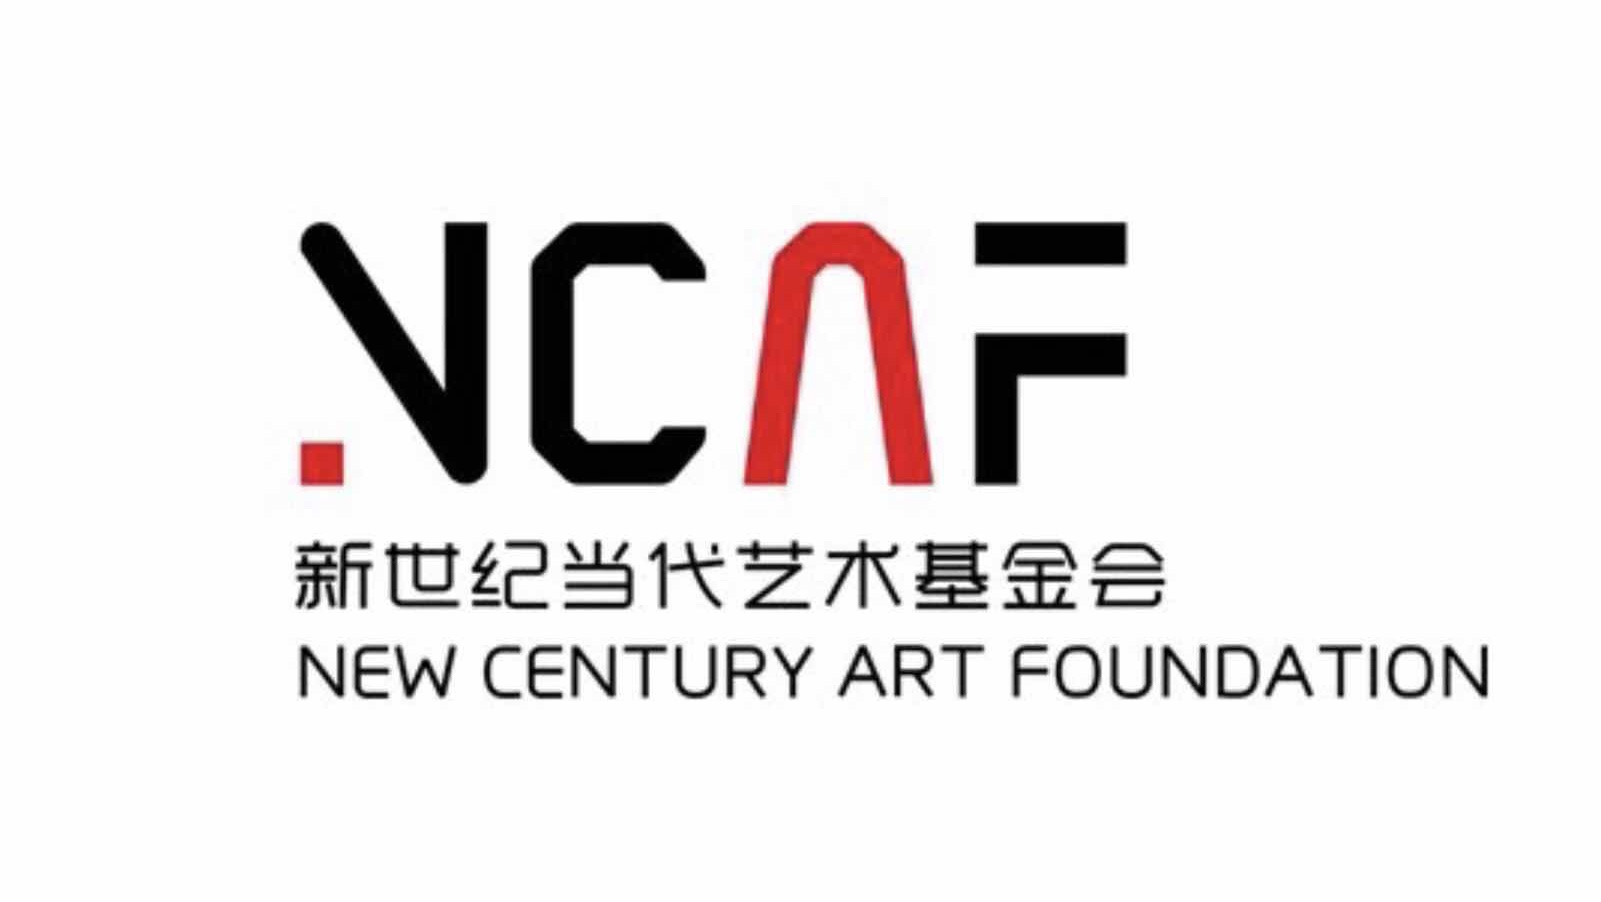 New Century Art Foundation